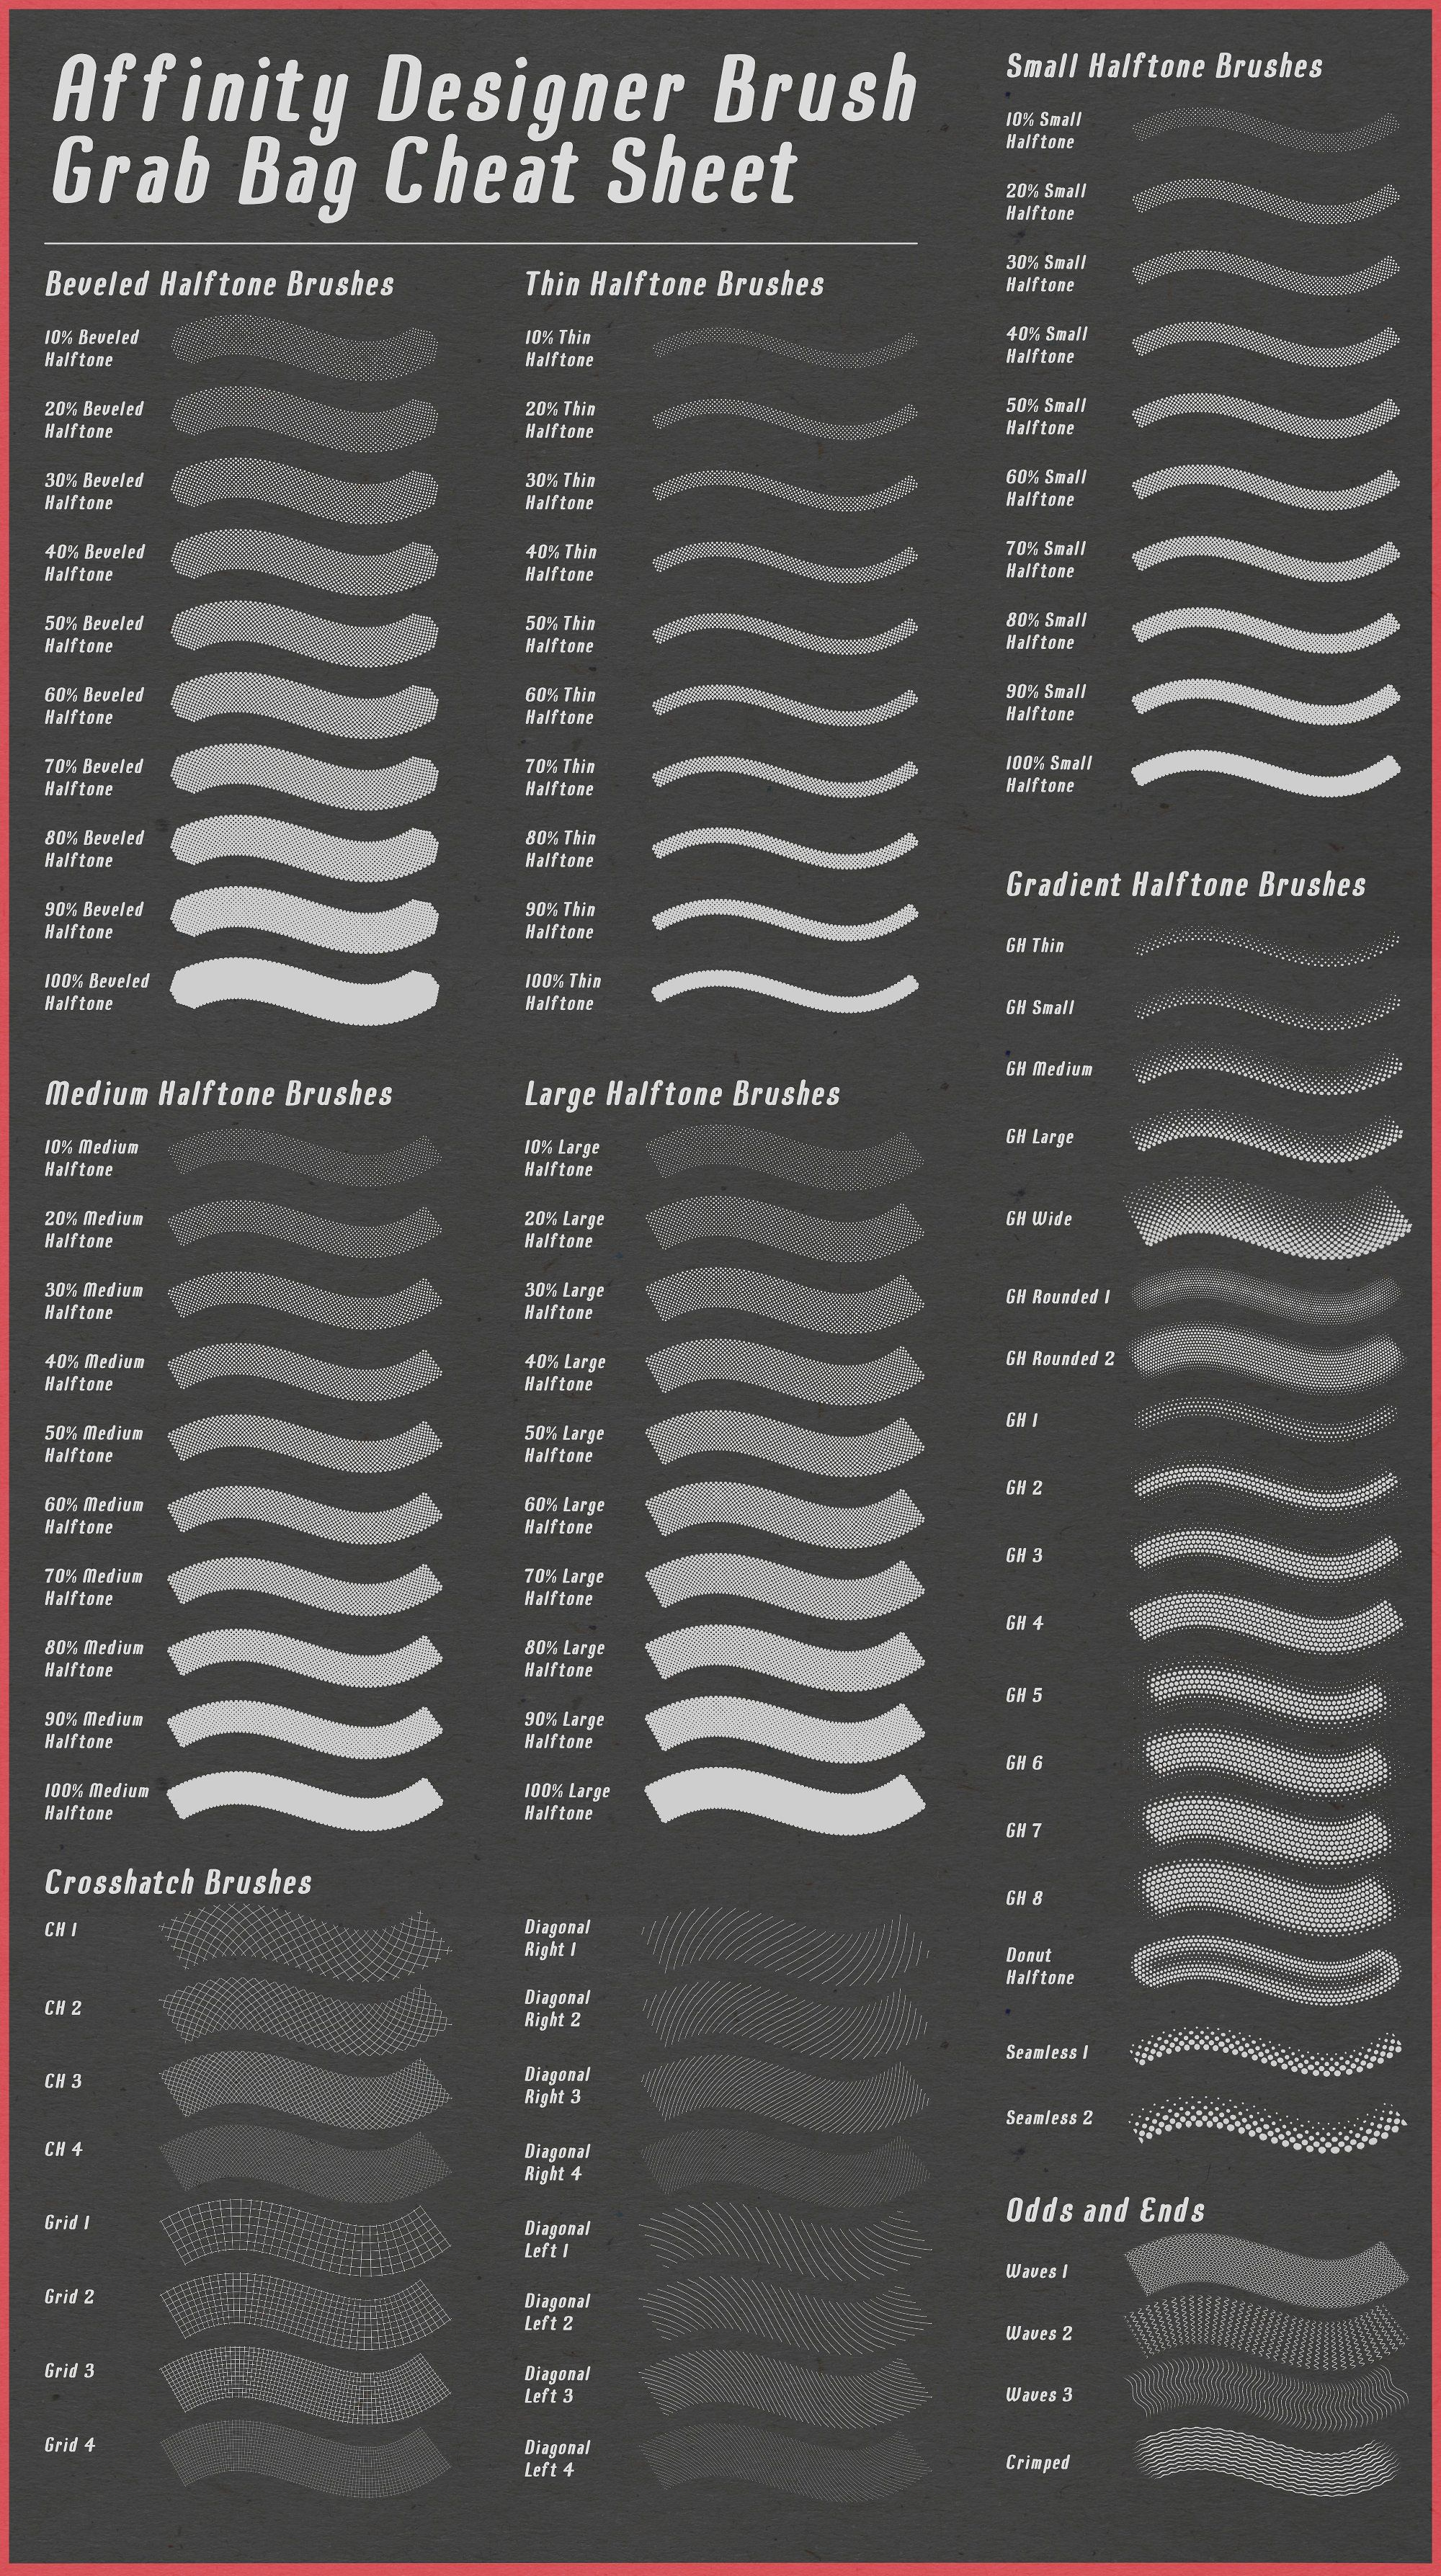 Affinity Designer Brush Grab Bag #depth#shadows#texture#ends